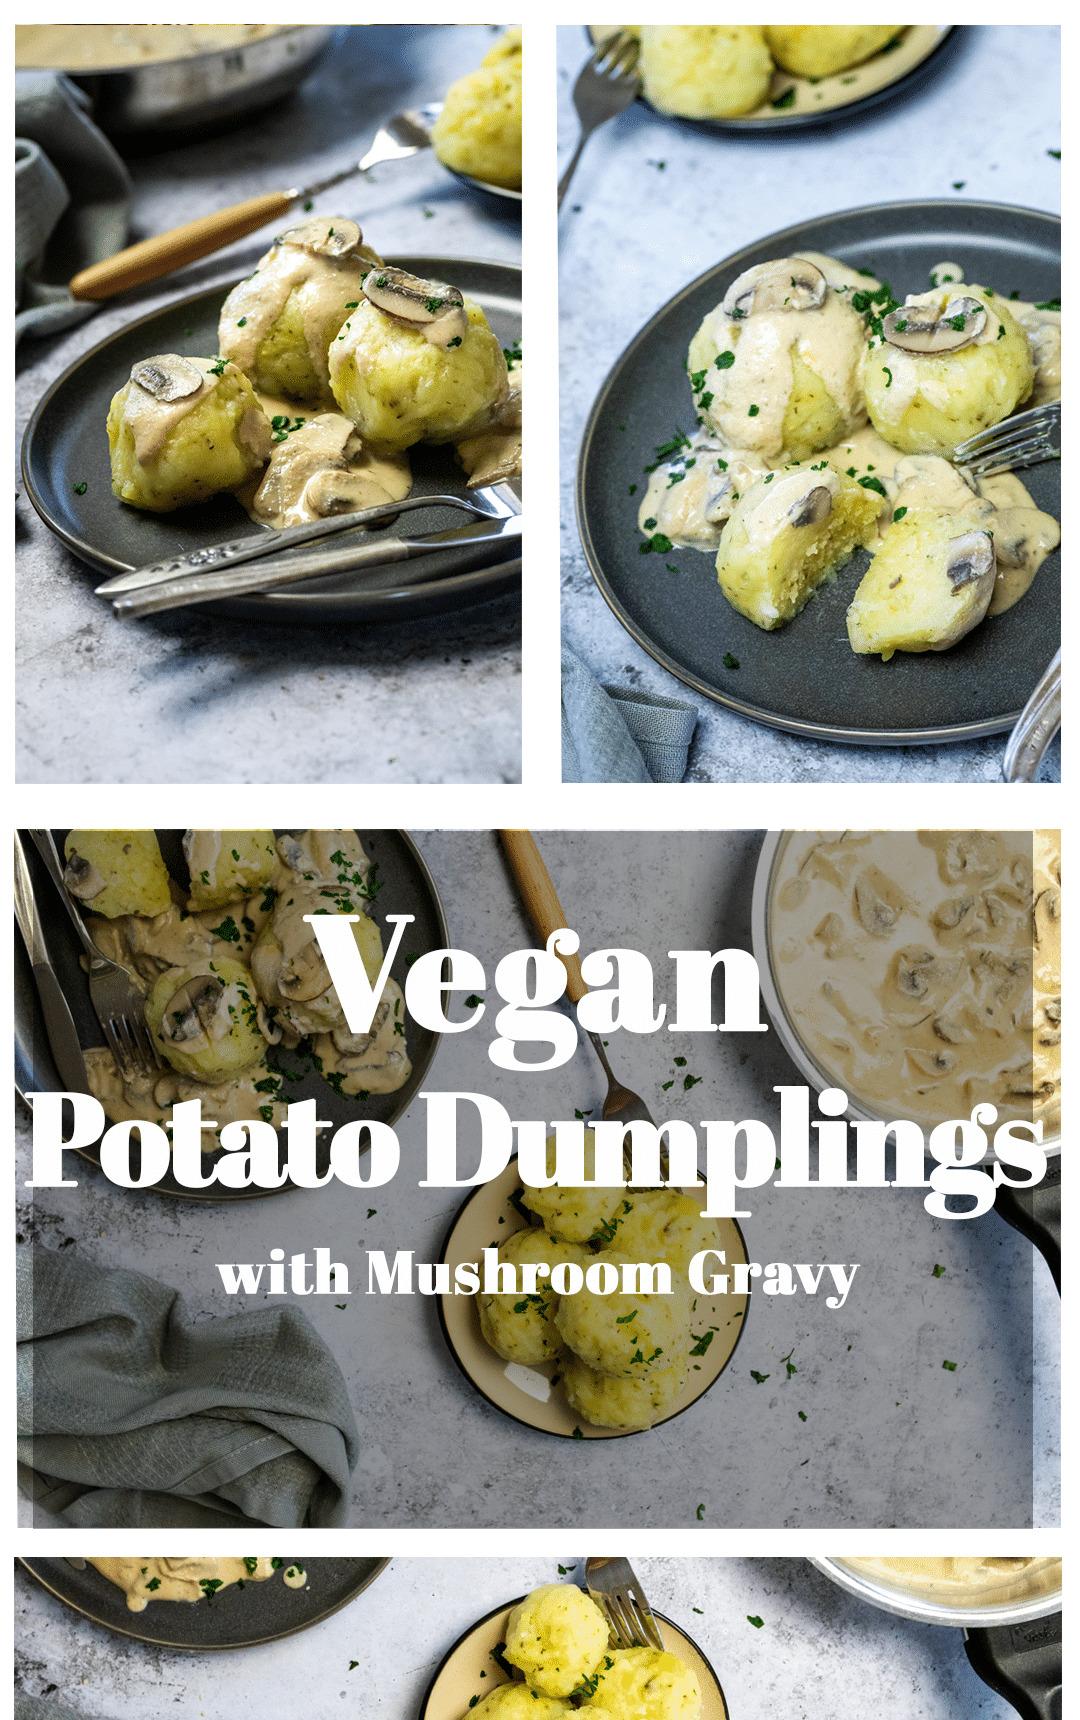 Graphic of vegan potato dumplings with cream mushroom sauce